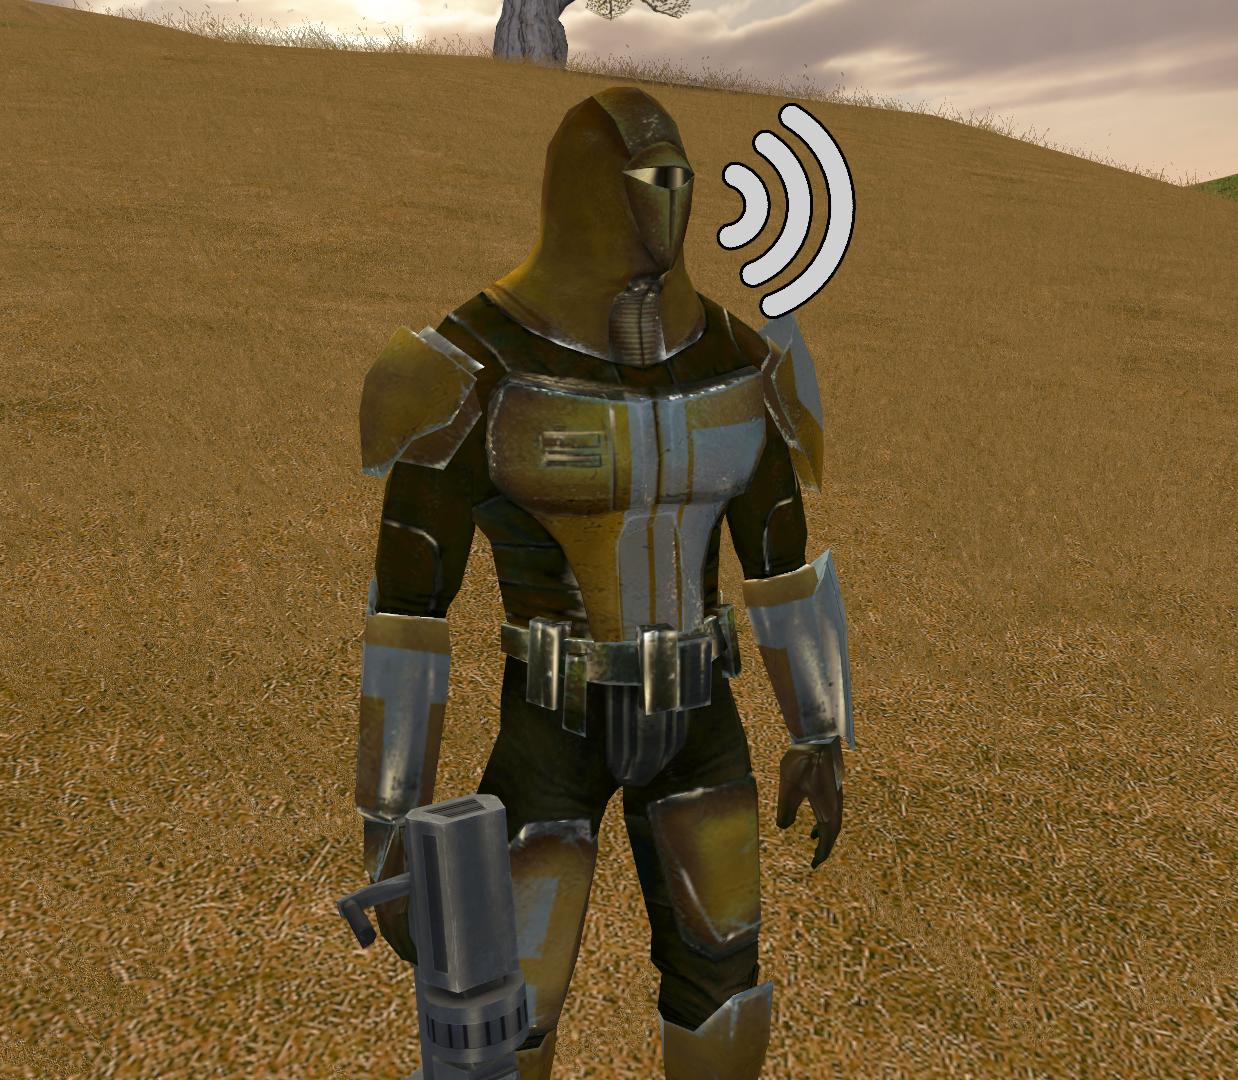 Canderous' helmet-filtered voice